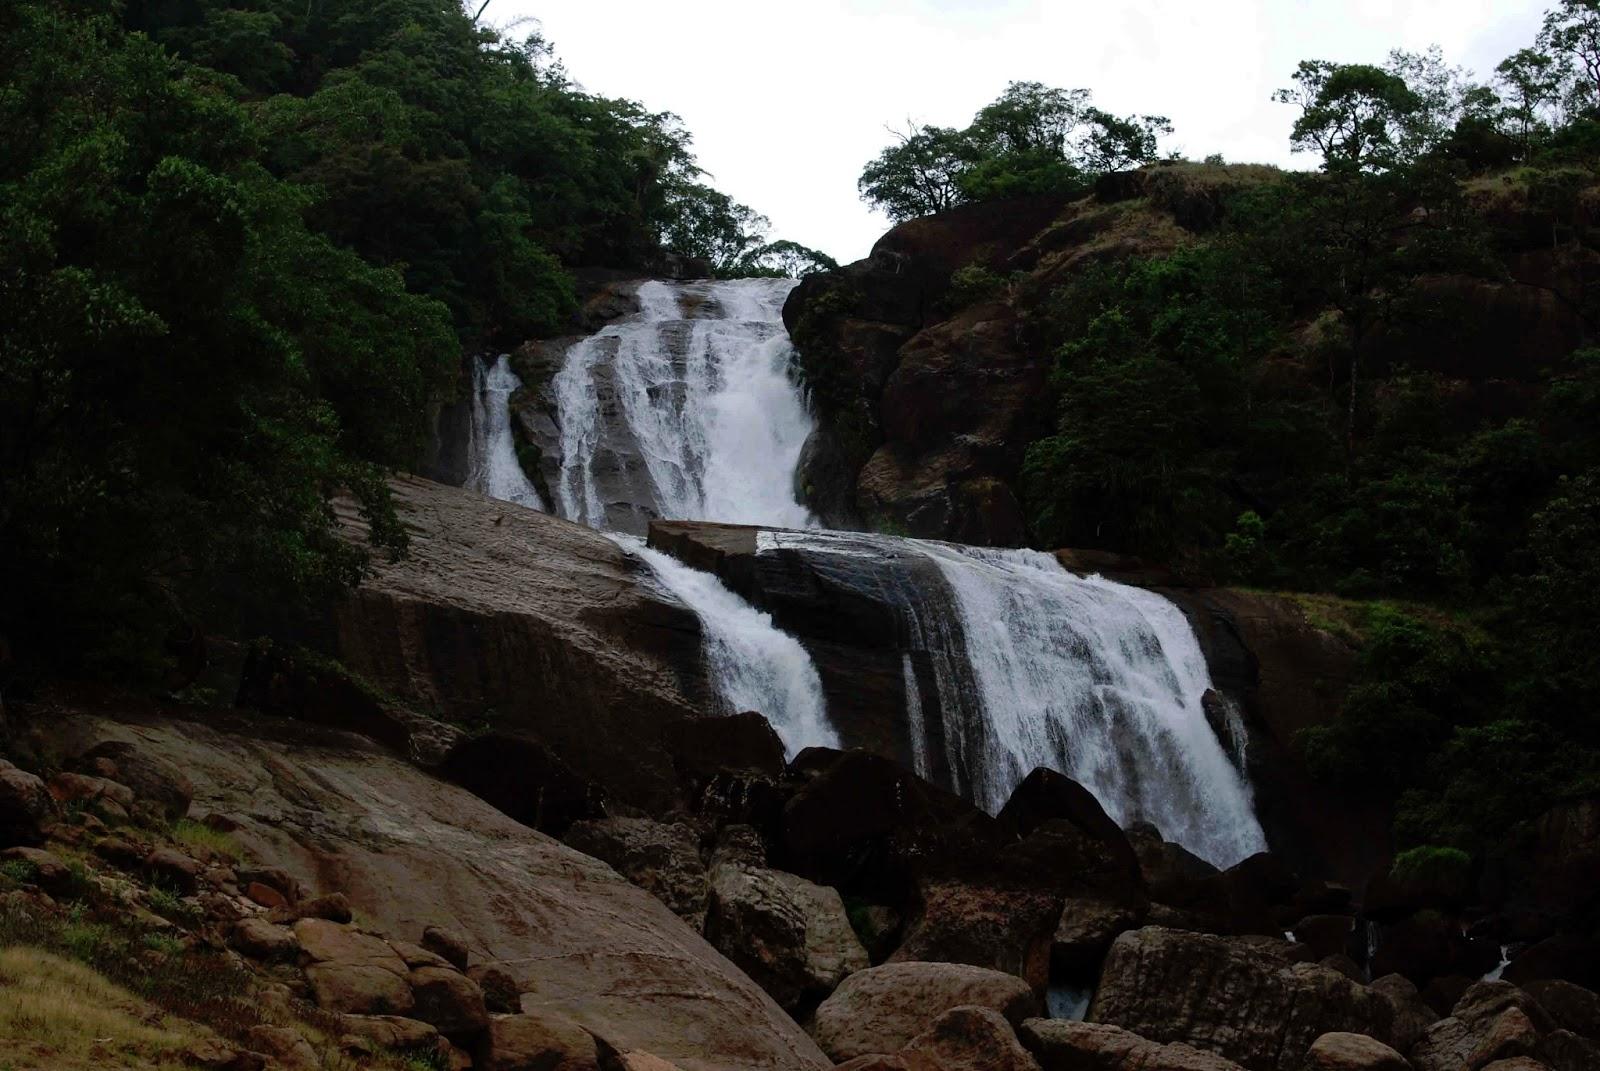 Vanatheertham Waterfalls,Karaiyar,Tirunelveli,Tamilnadu Photo by Sarath Sree kumar